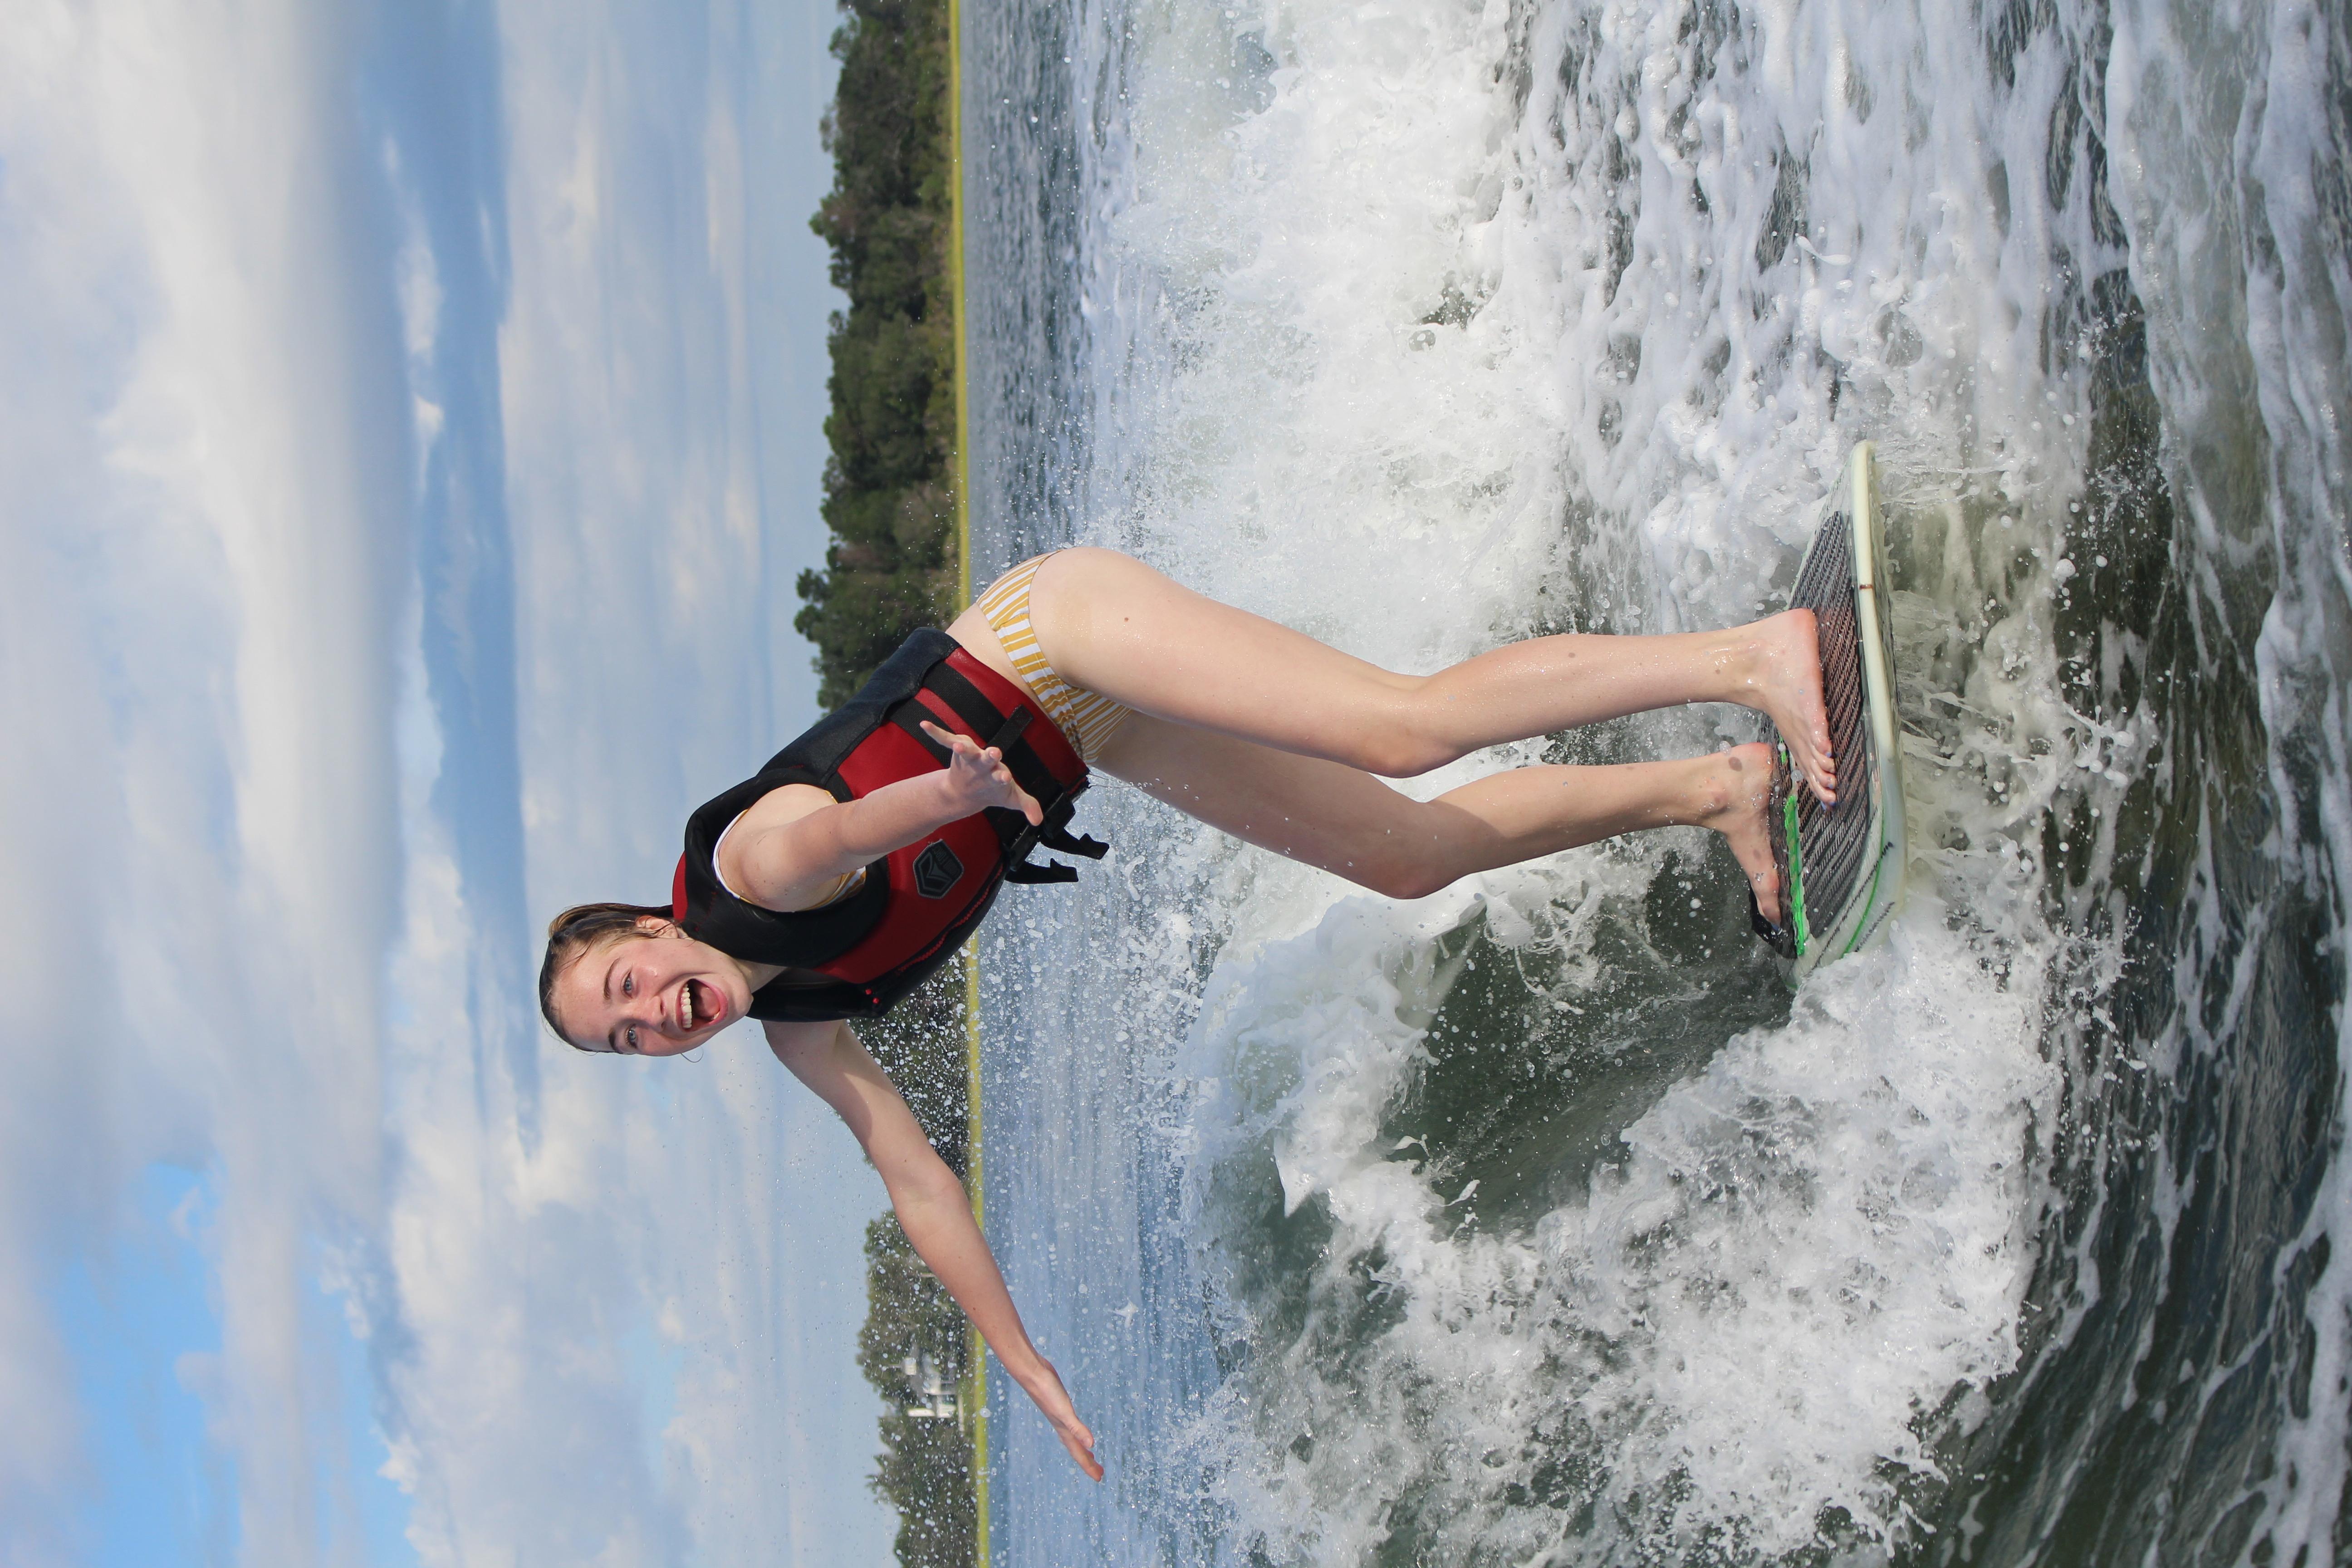 Wakesurfing Wrightsville beach